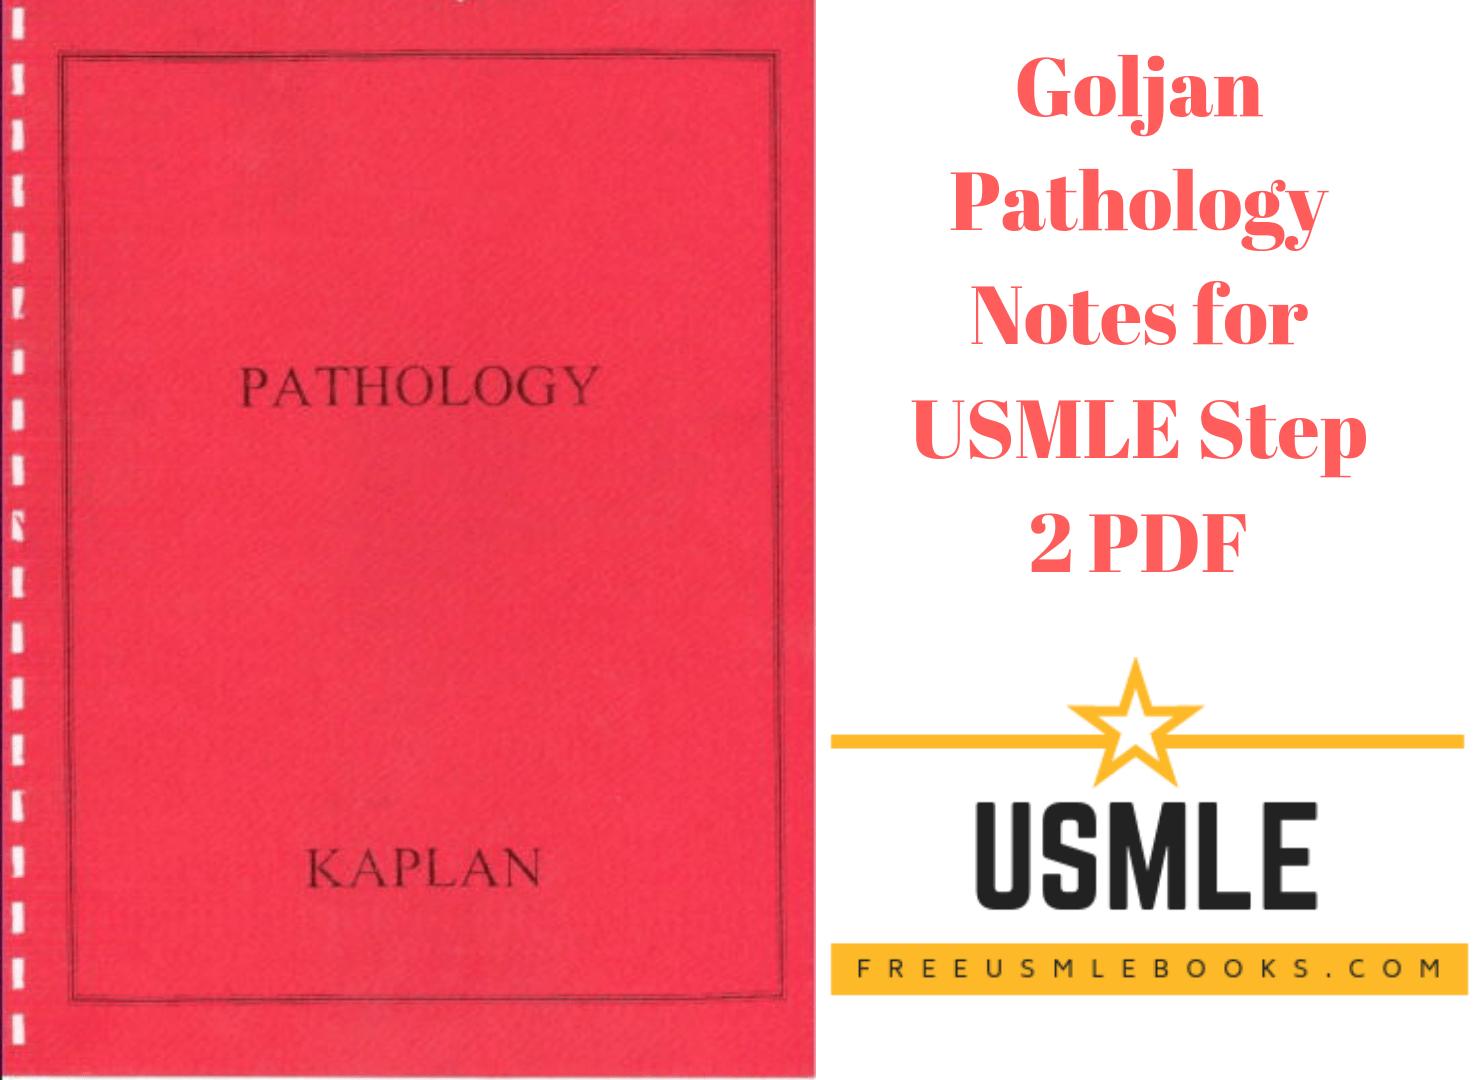 Download Goljan Pathology Notes for USMLE Step 2 PDF Free [Direct Link]